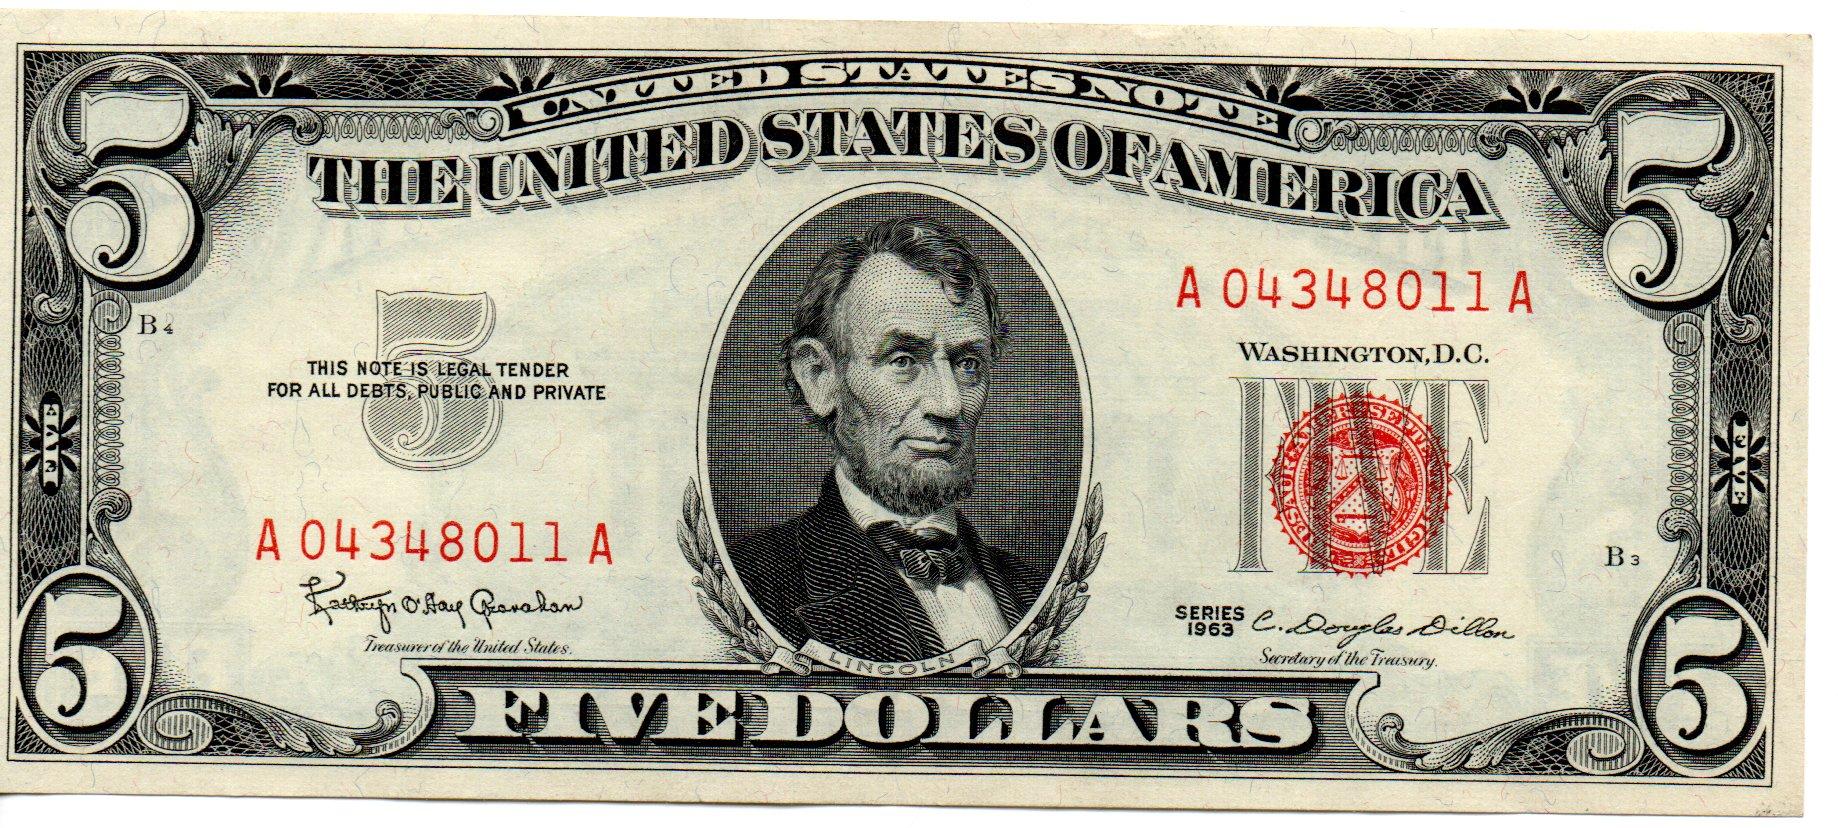 USA 5 Dollars 1963 P-383a A04348011A